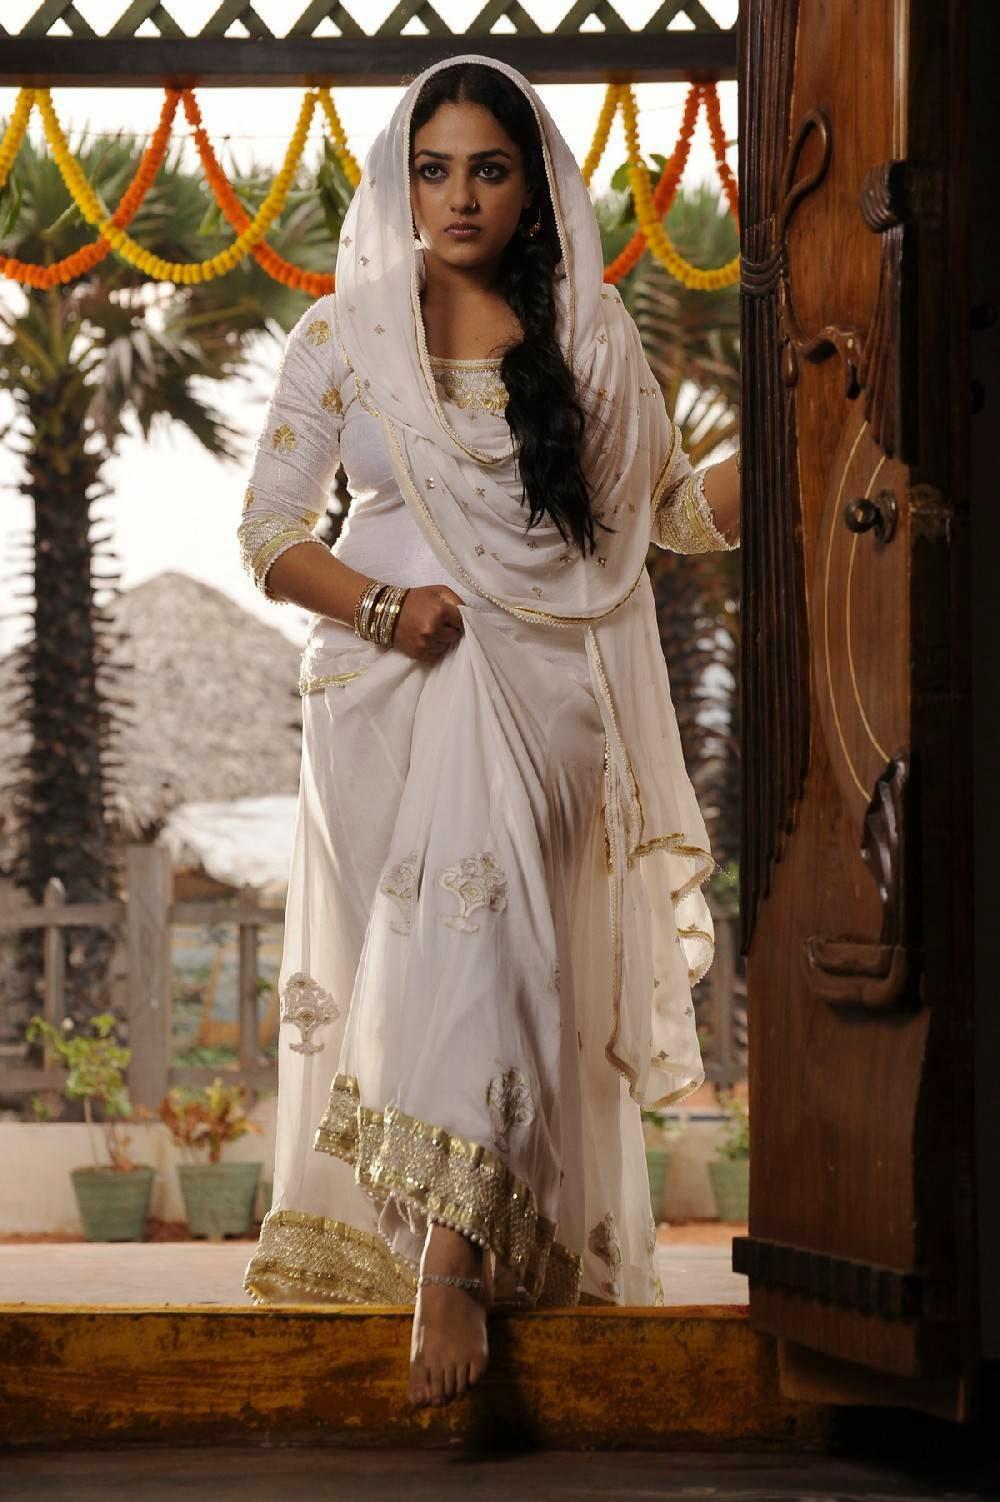 Actress Nithya Menon Latest Cute Hot Spicy Photos Gallery From Malli Malli Idi Raani Roju Movie